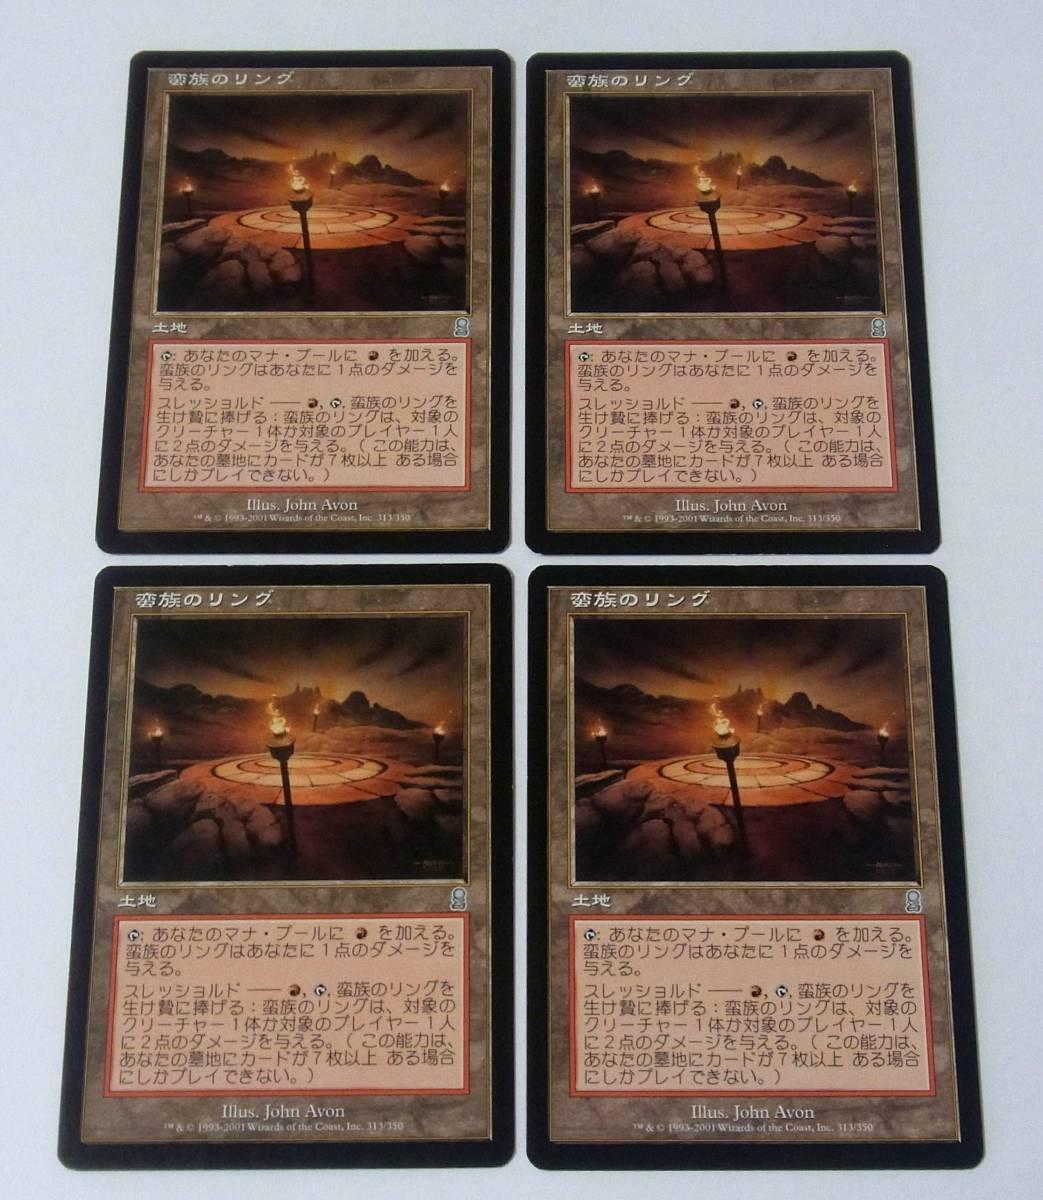 MTG163★ODY 蛮族のリング/Barbarian Ring 日本語版 4枚セット 中古品 _画像1